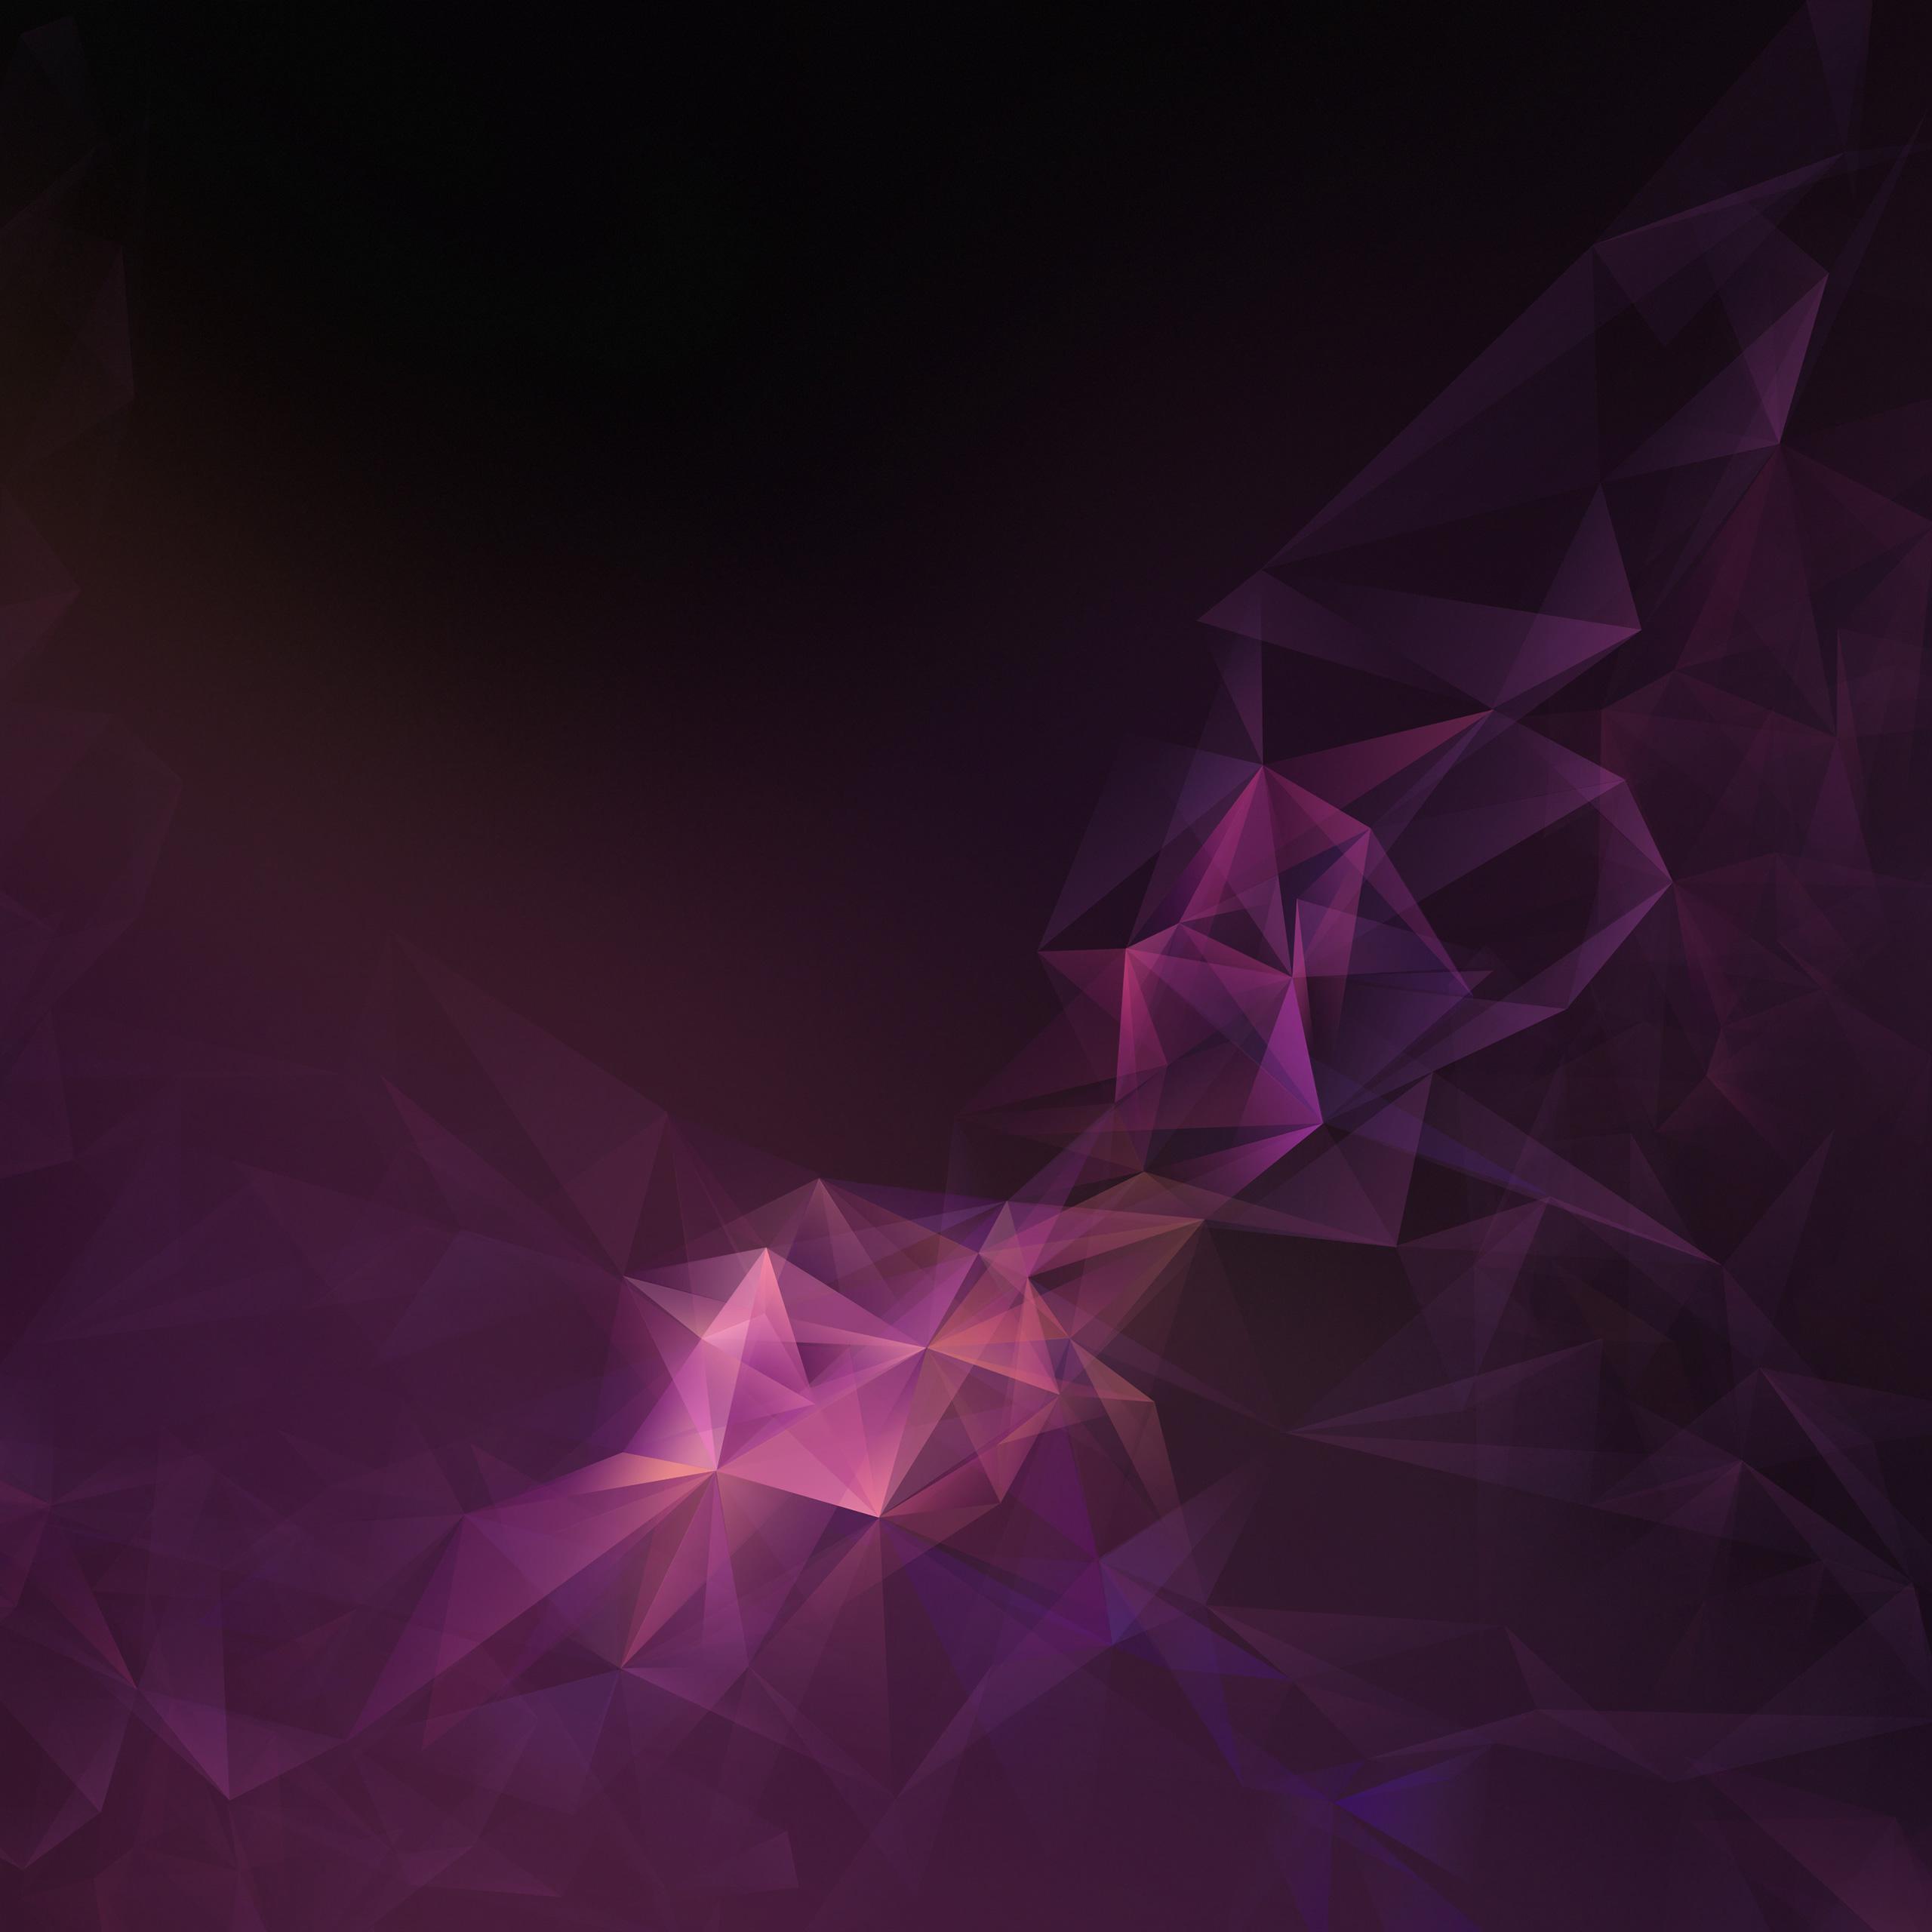 hinh-nen-samsung-galaxy-s9-va-s9-plus-dep-14